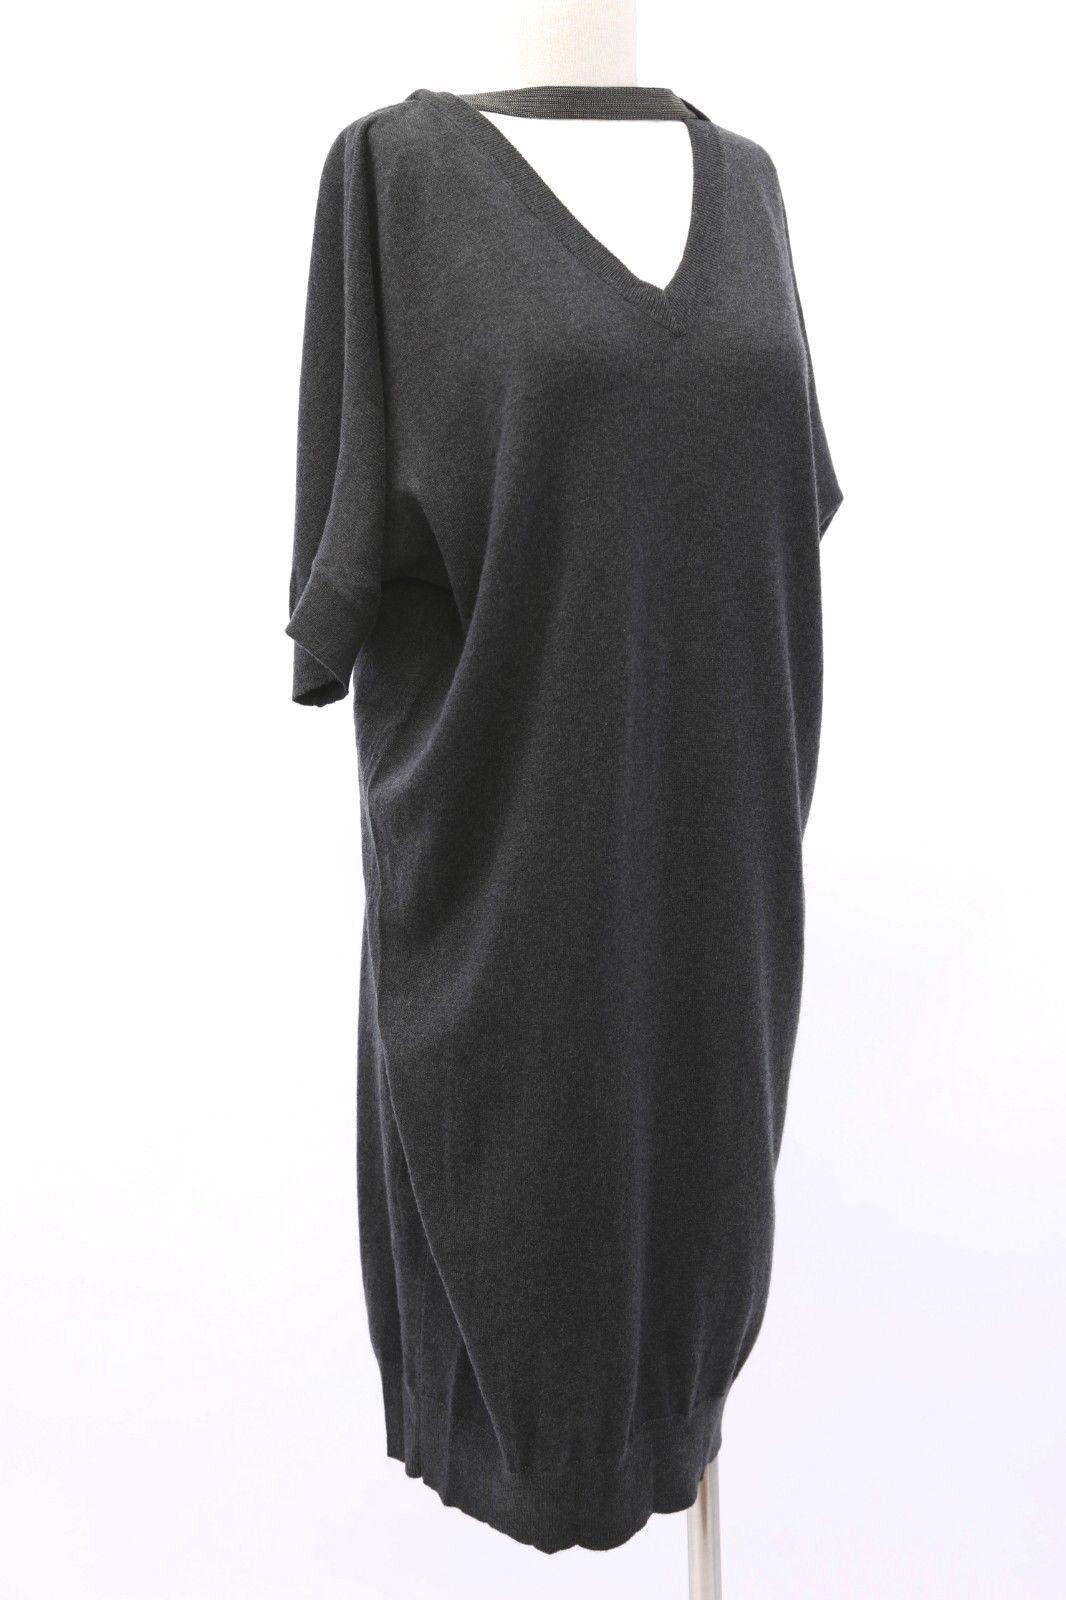 NWT  Brunello Cucinelli 100% Cashmere Knit Dress W Collar Beading Sz M A181